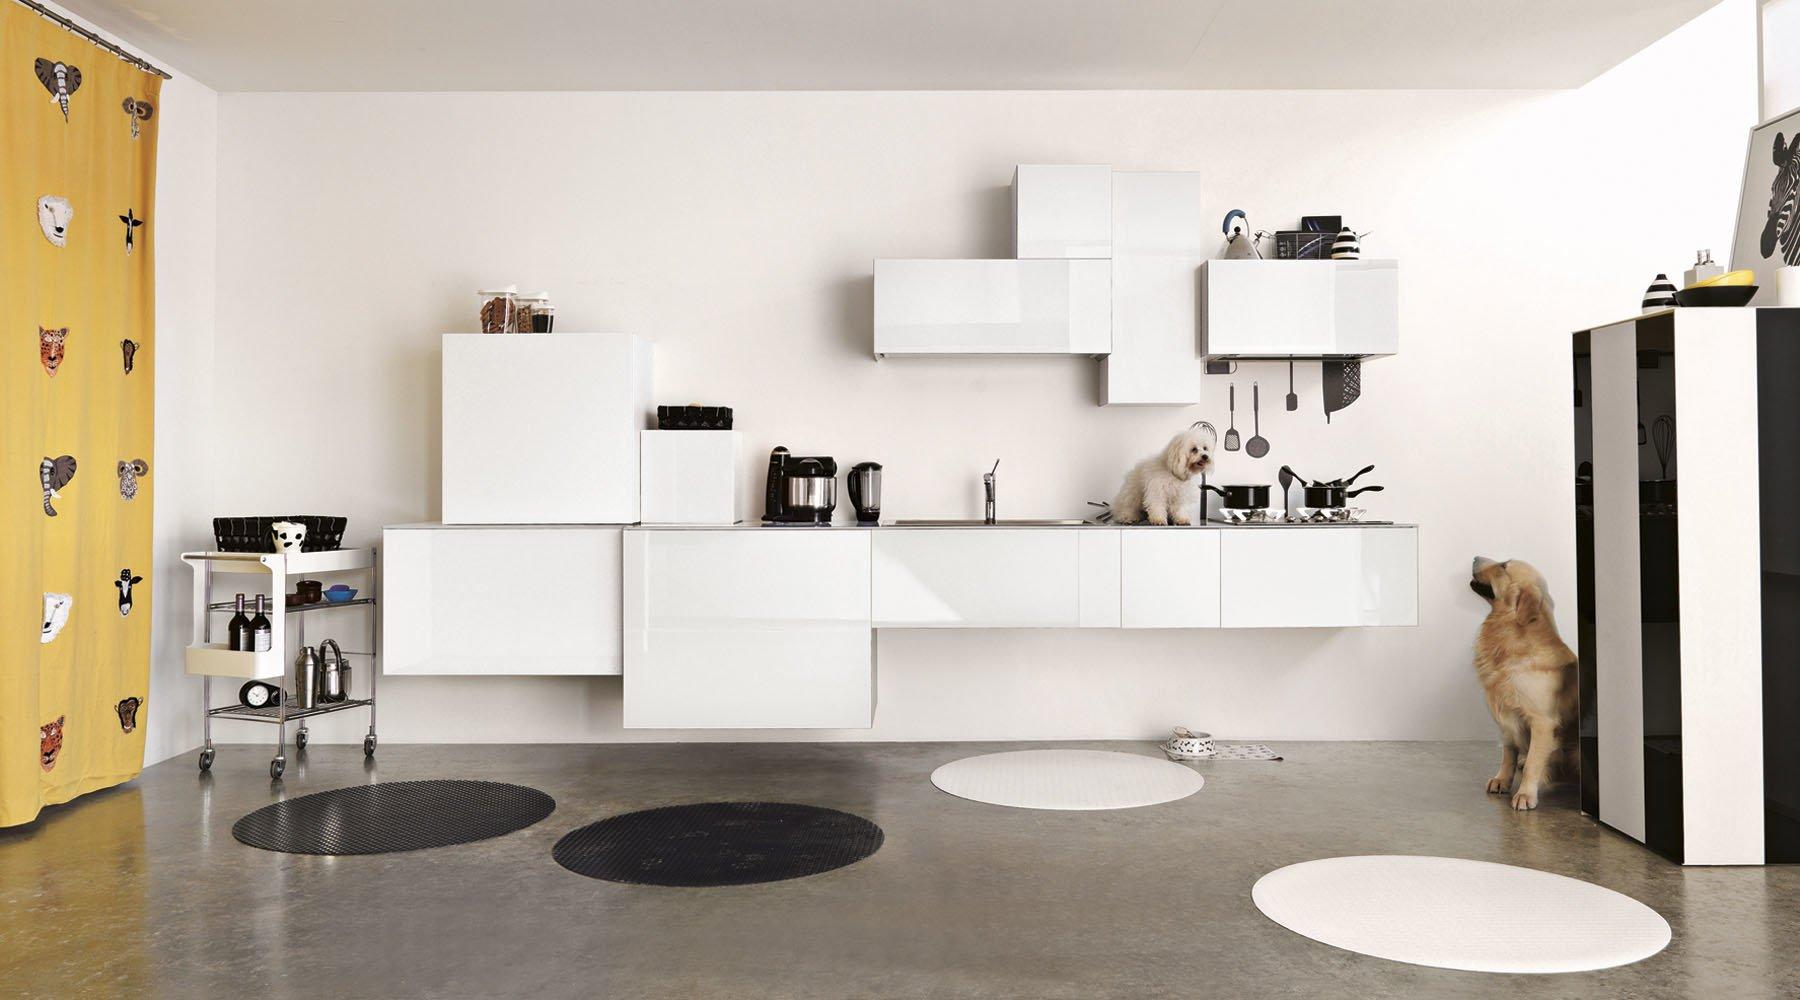 Mobili per cucina cucina 36e8 da lago - Lago mobili catalogo ...